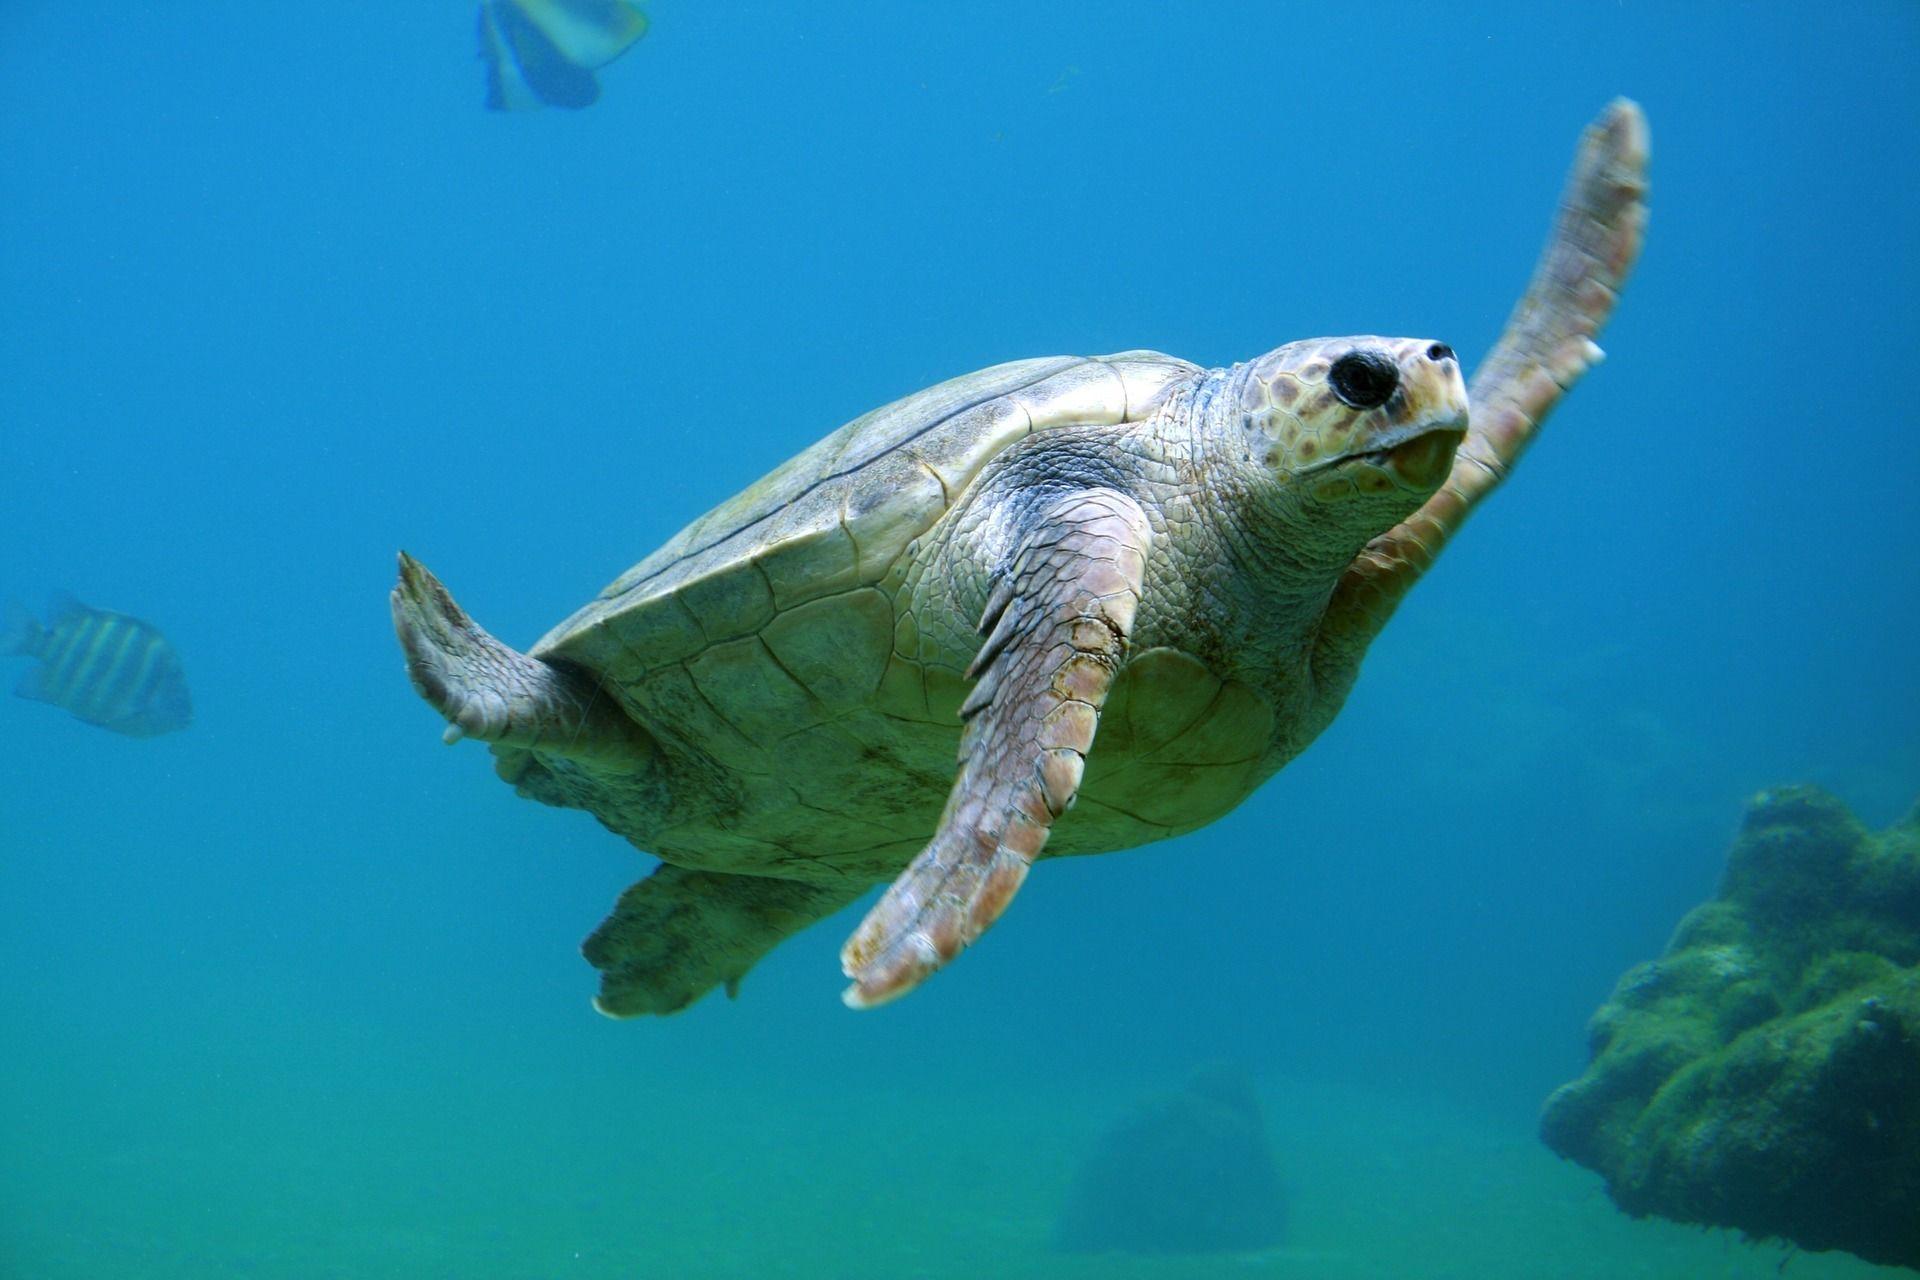 Красивое, необычное фото черепахи на природе